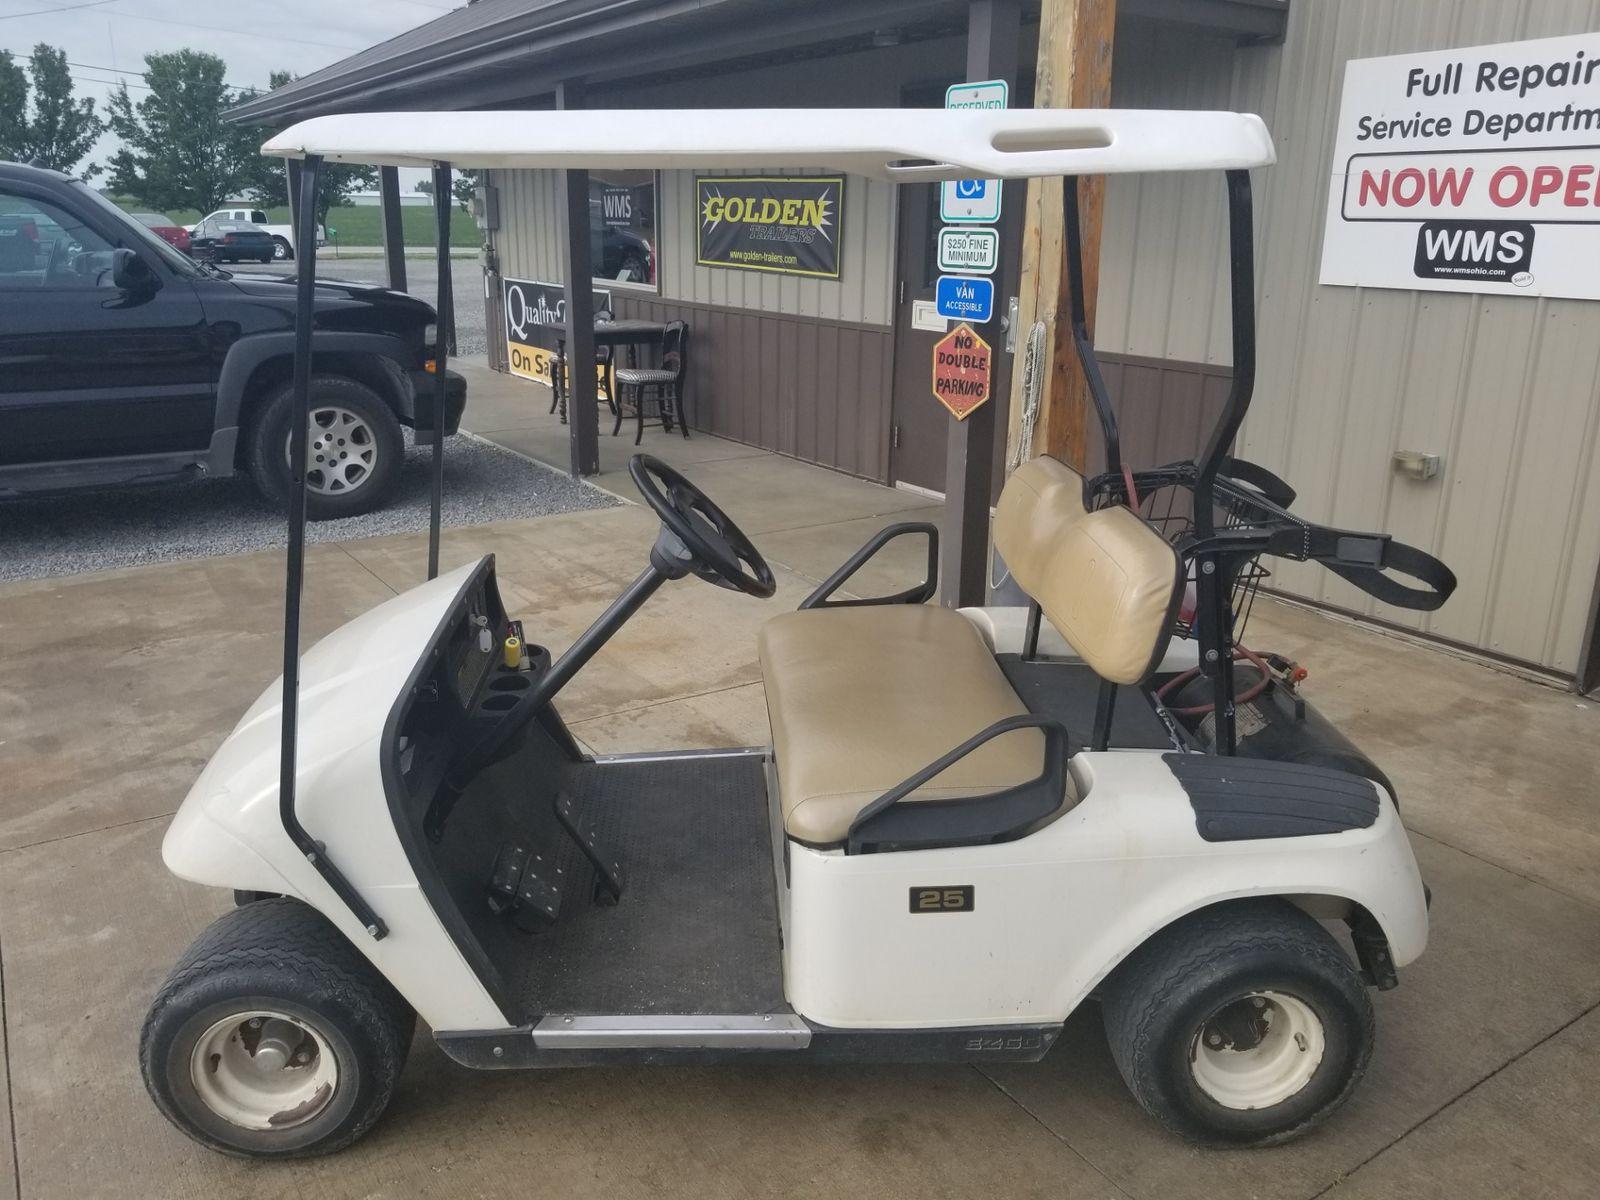 2003 Ez Go GOLF CART GOLF CART Golf Cart Van on delivery cart, gem food truck cart, street cart, van pool, pushing grocery cart, crazy cart,